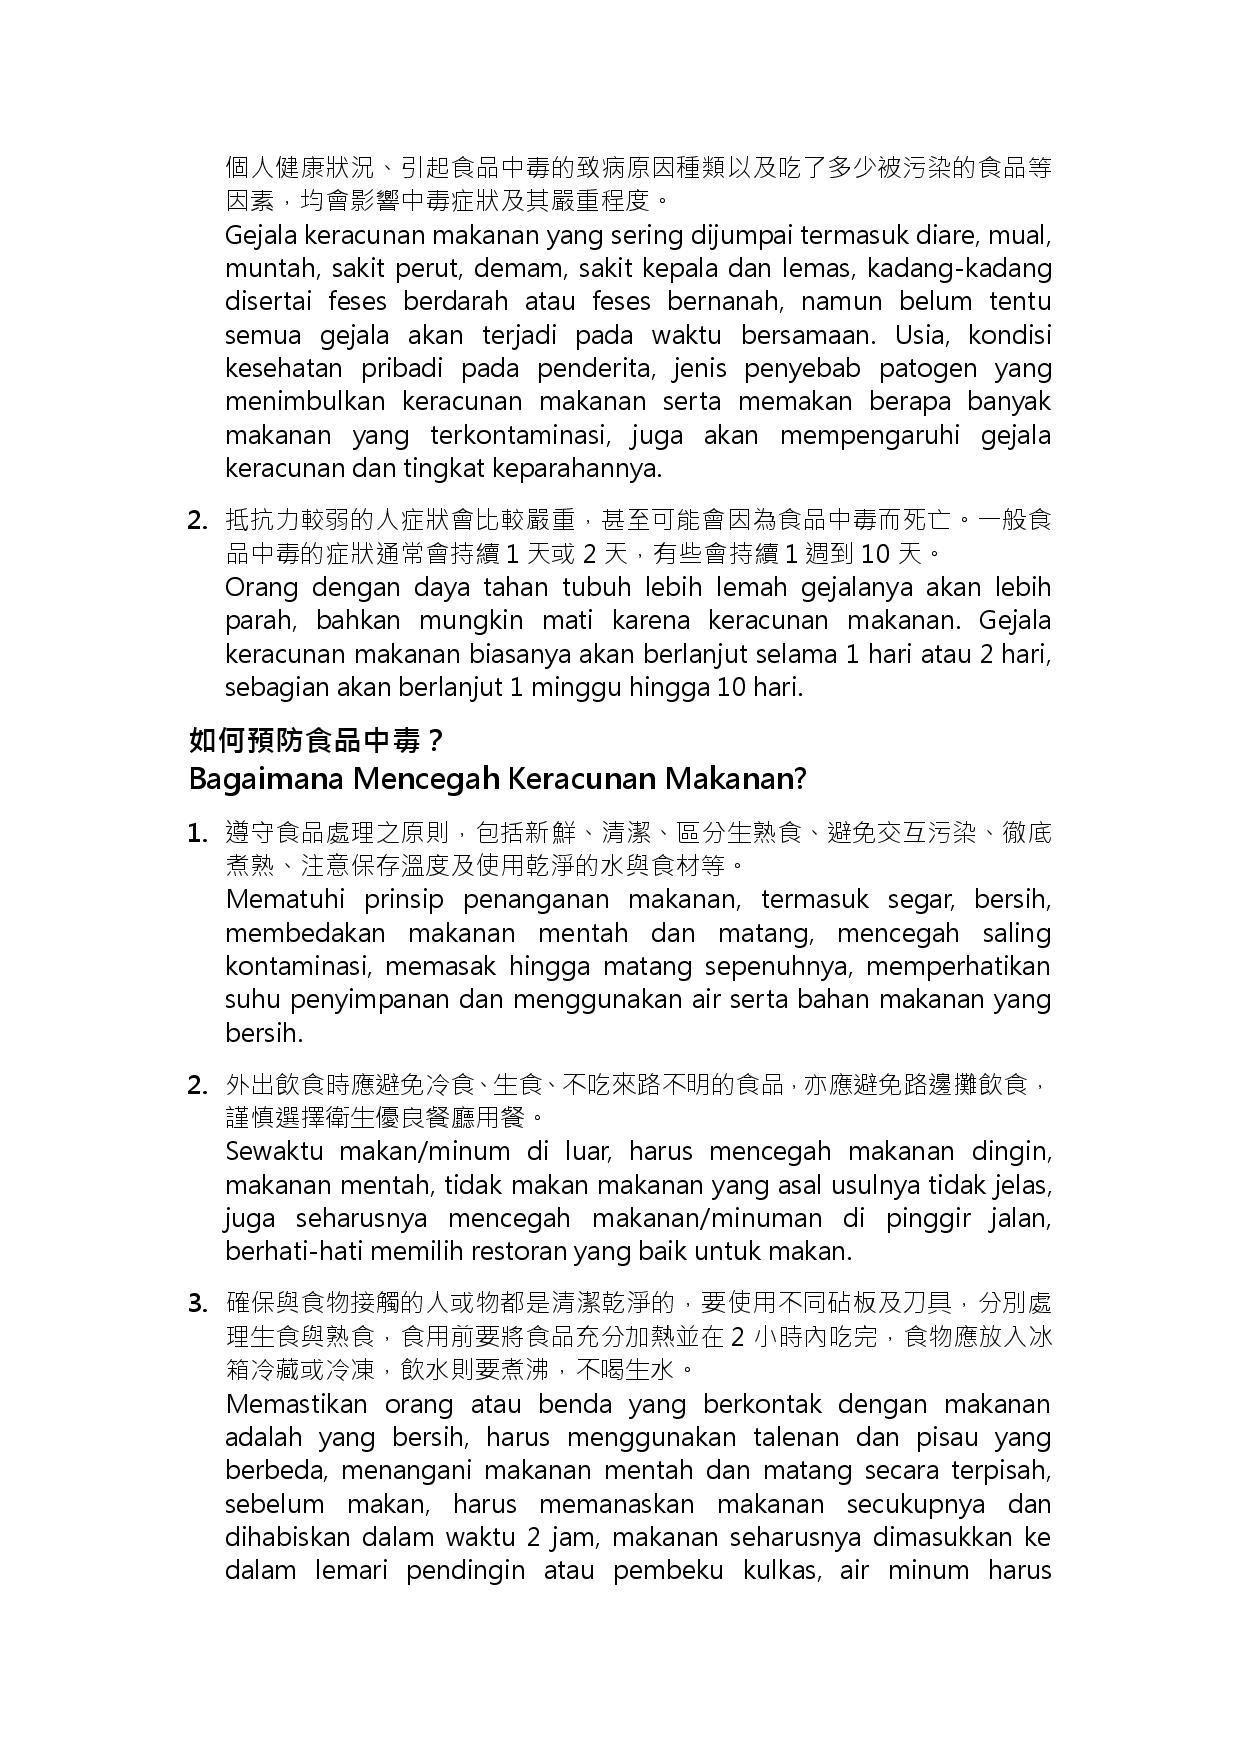 詳如附件【Klik】Mencegah Keracunan Makanan(Halaman 2)預防食品中毒(印尼文)